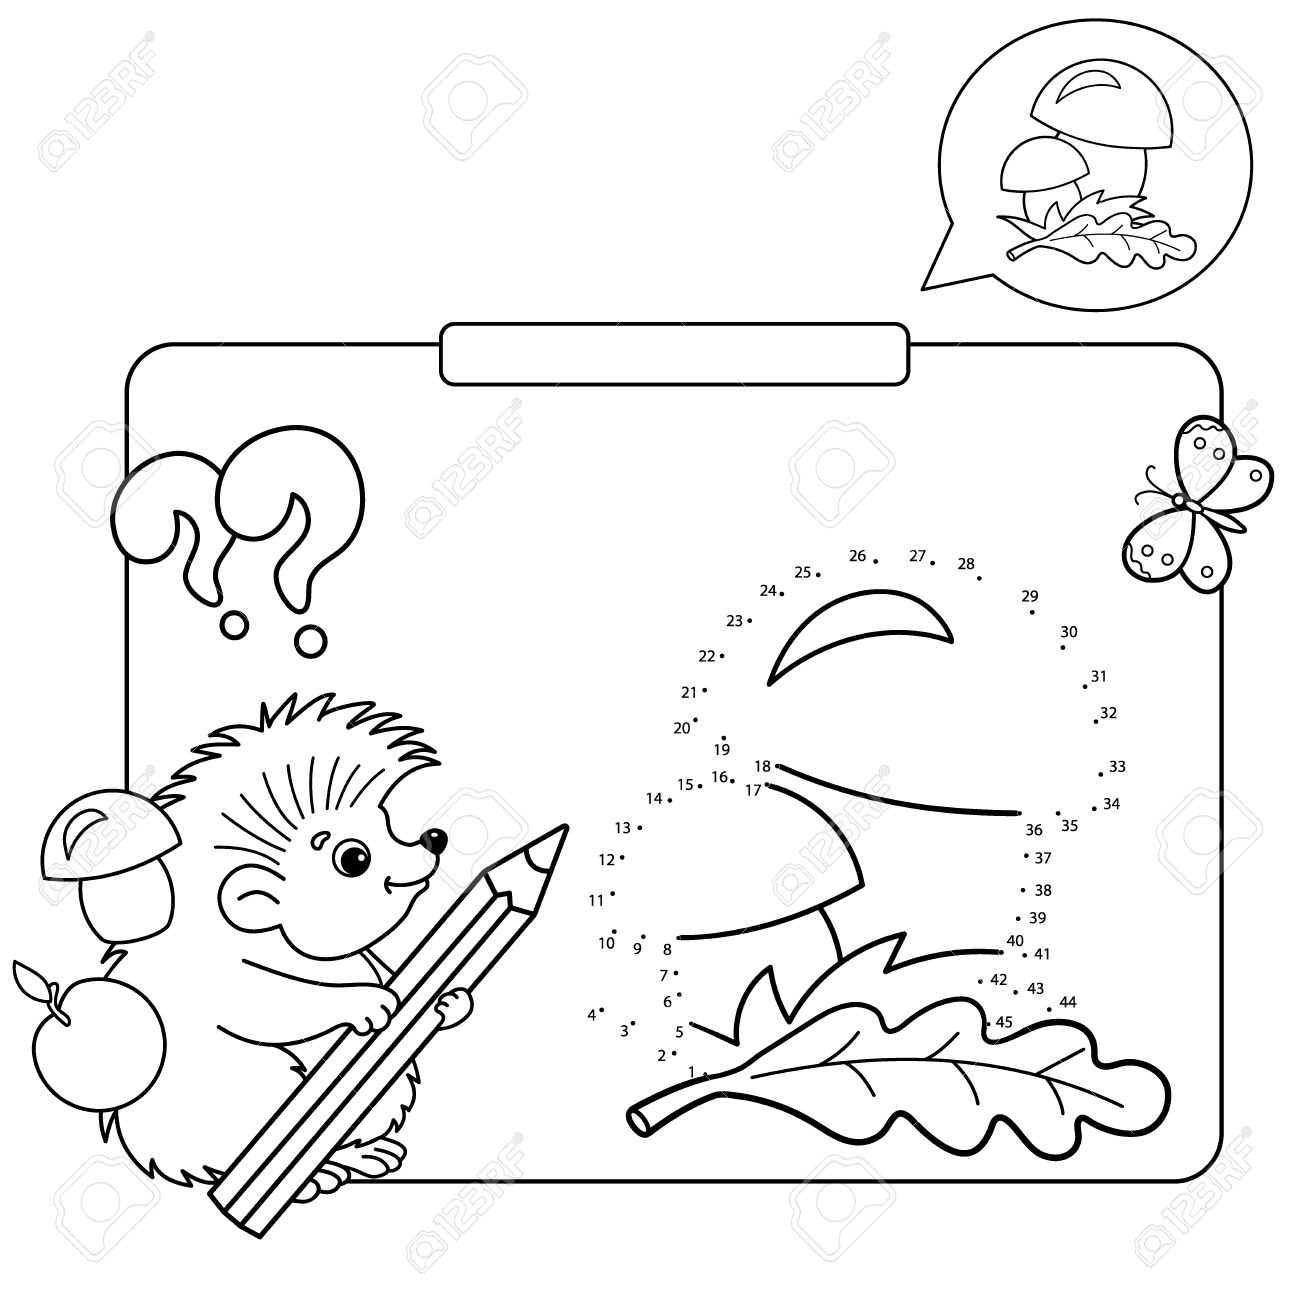 Educational Games For Kids Numbers Game Mushrooms Coloring